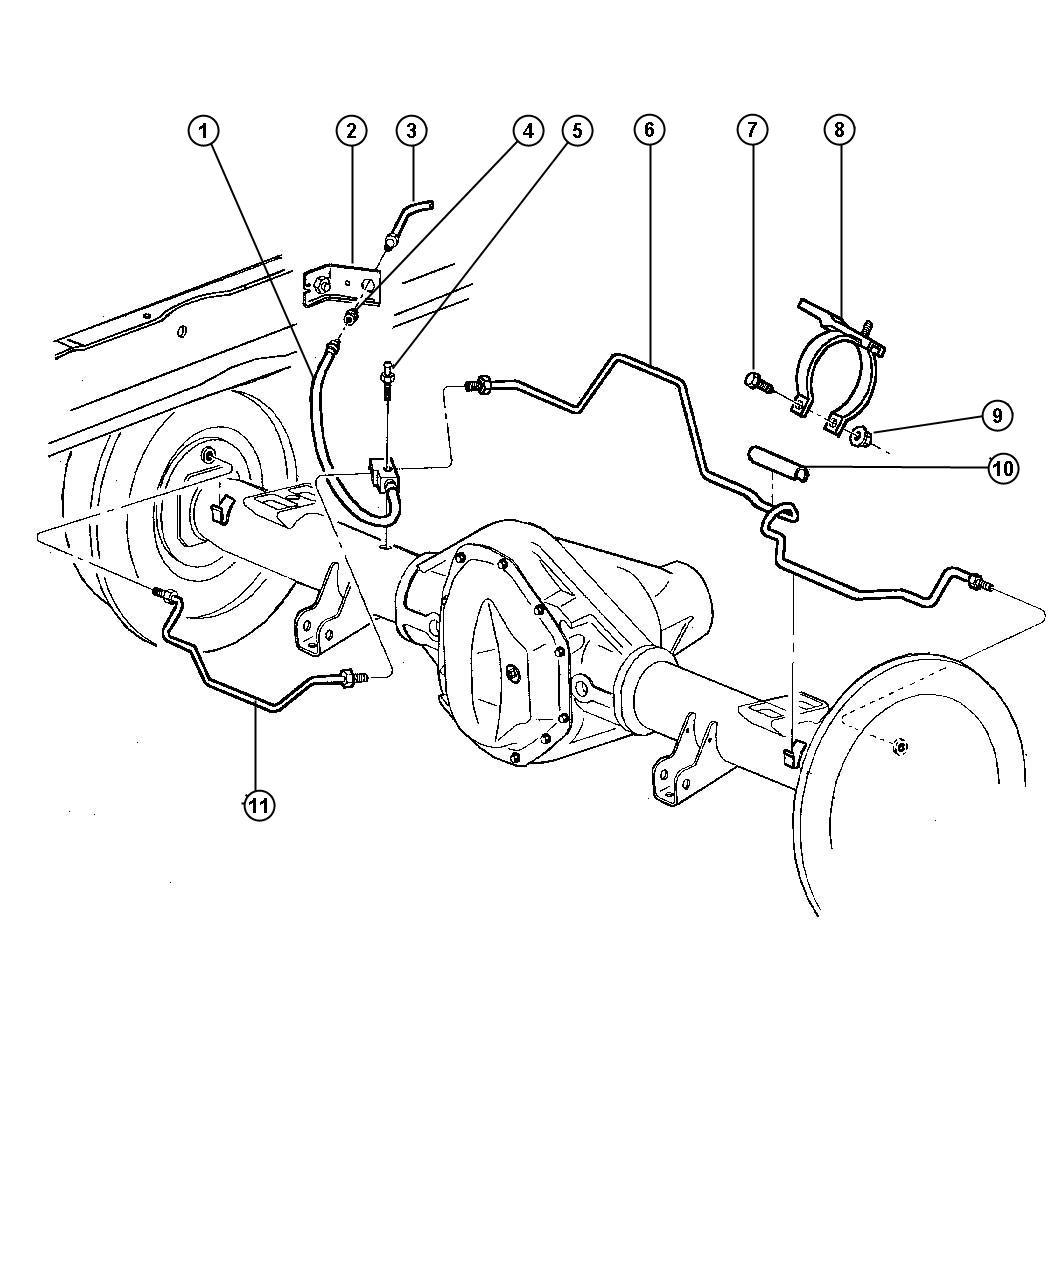 Front End Diagram Dodge Dakota 3 9l